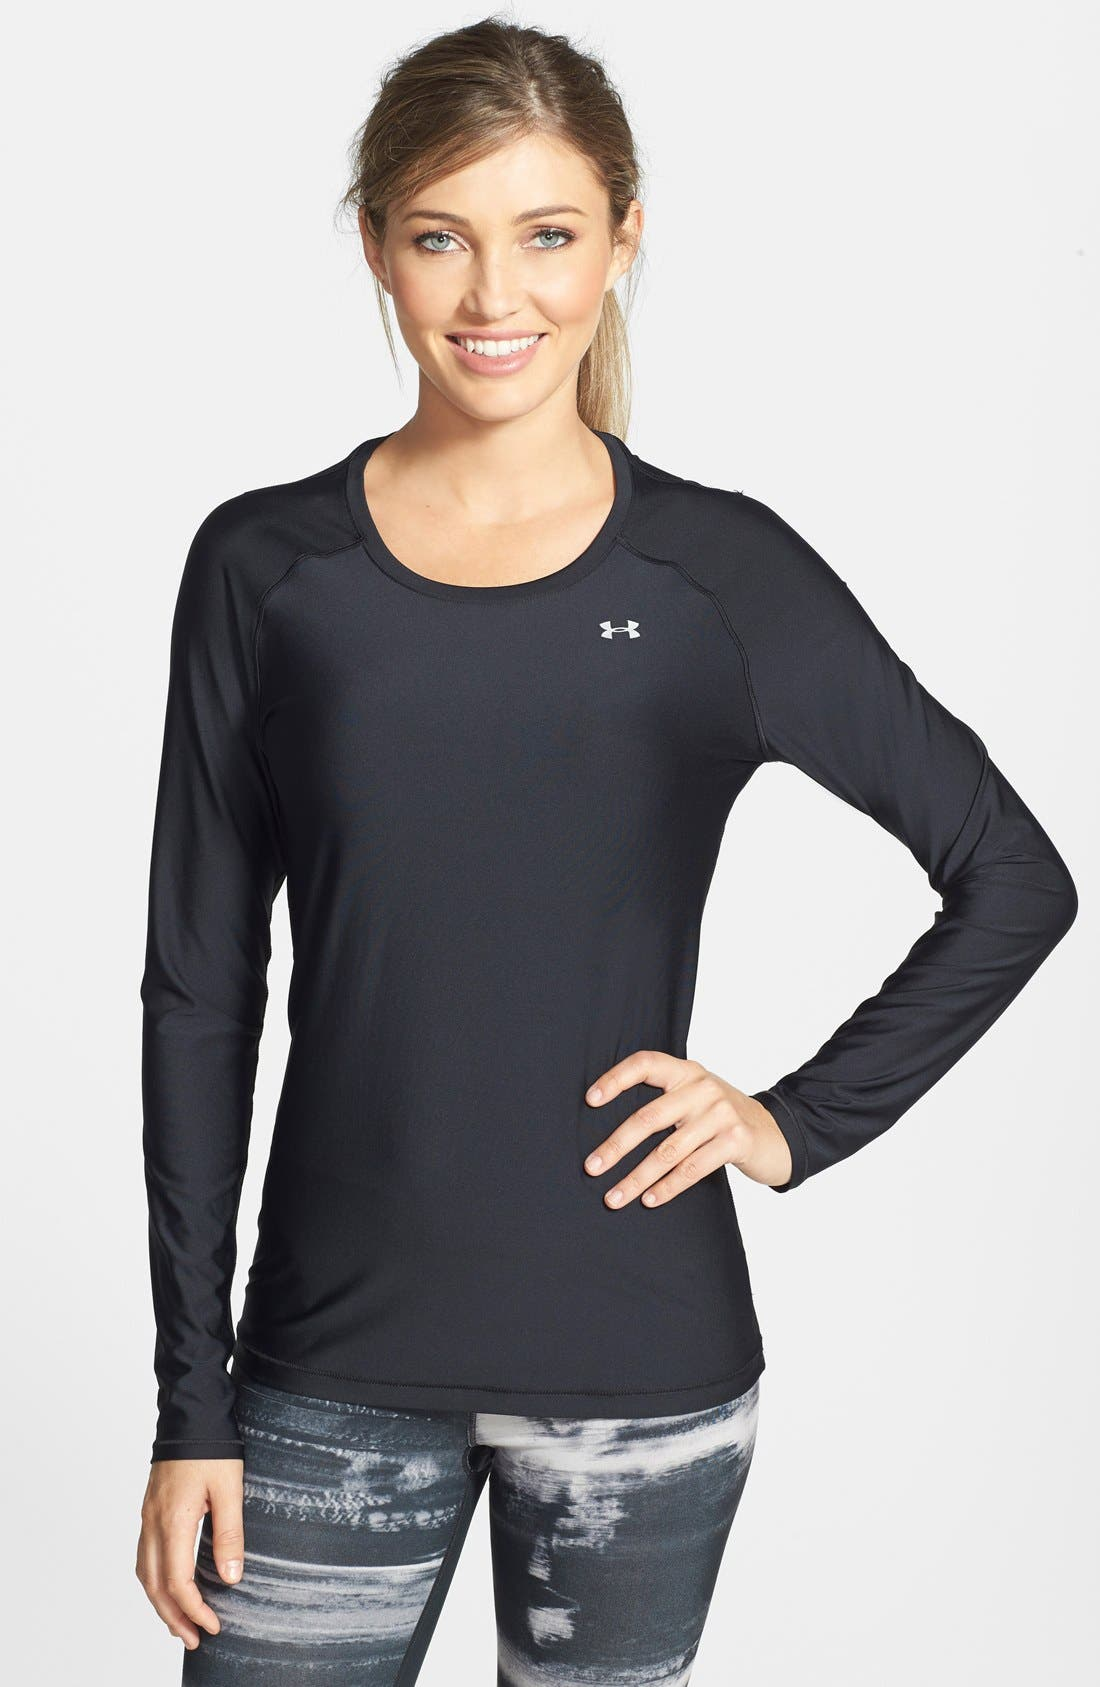 'Alpha Novelty' HeatGear<sup>®</sup> Long Sleeve Top,                         Main,                         color, Black/ Metallic Silver